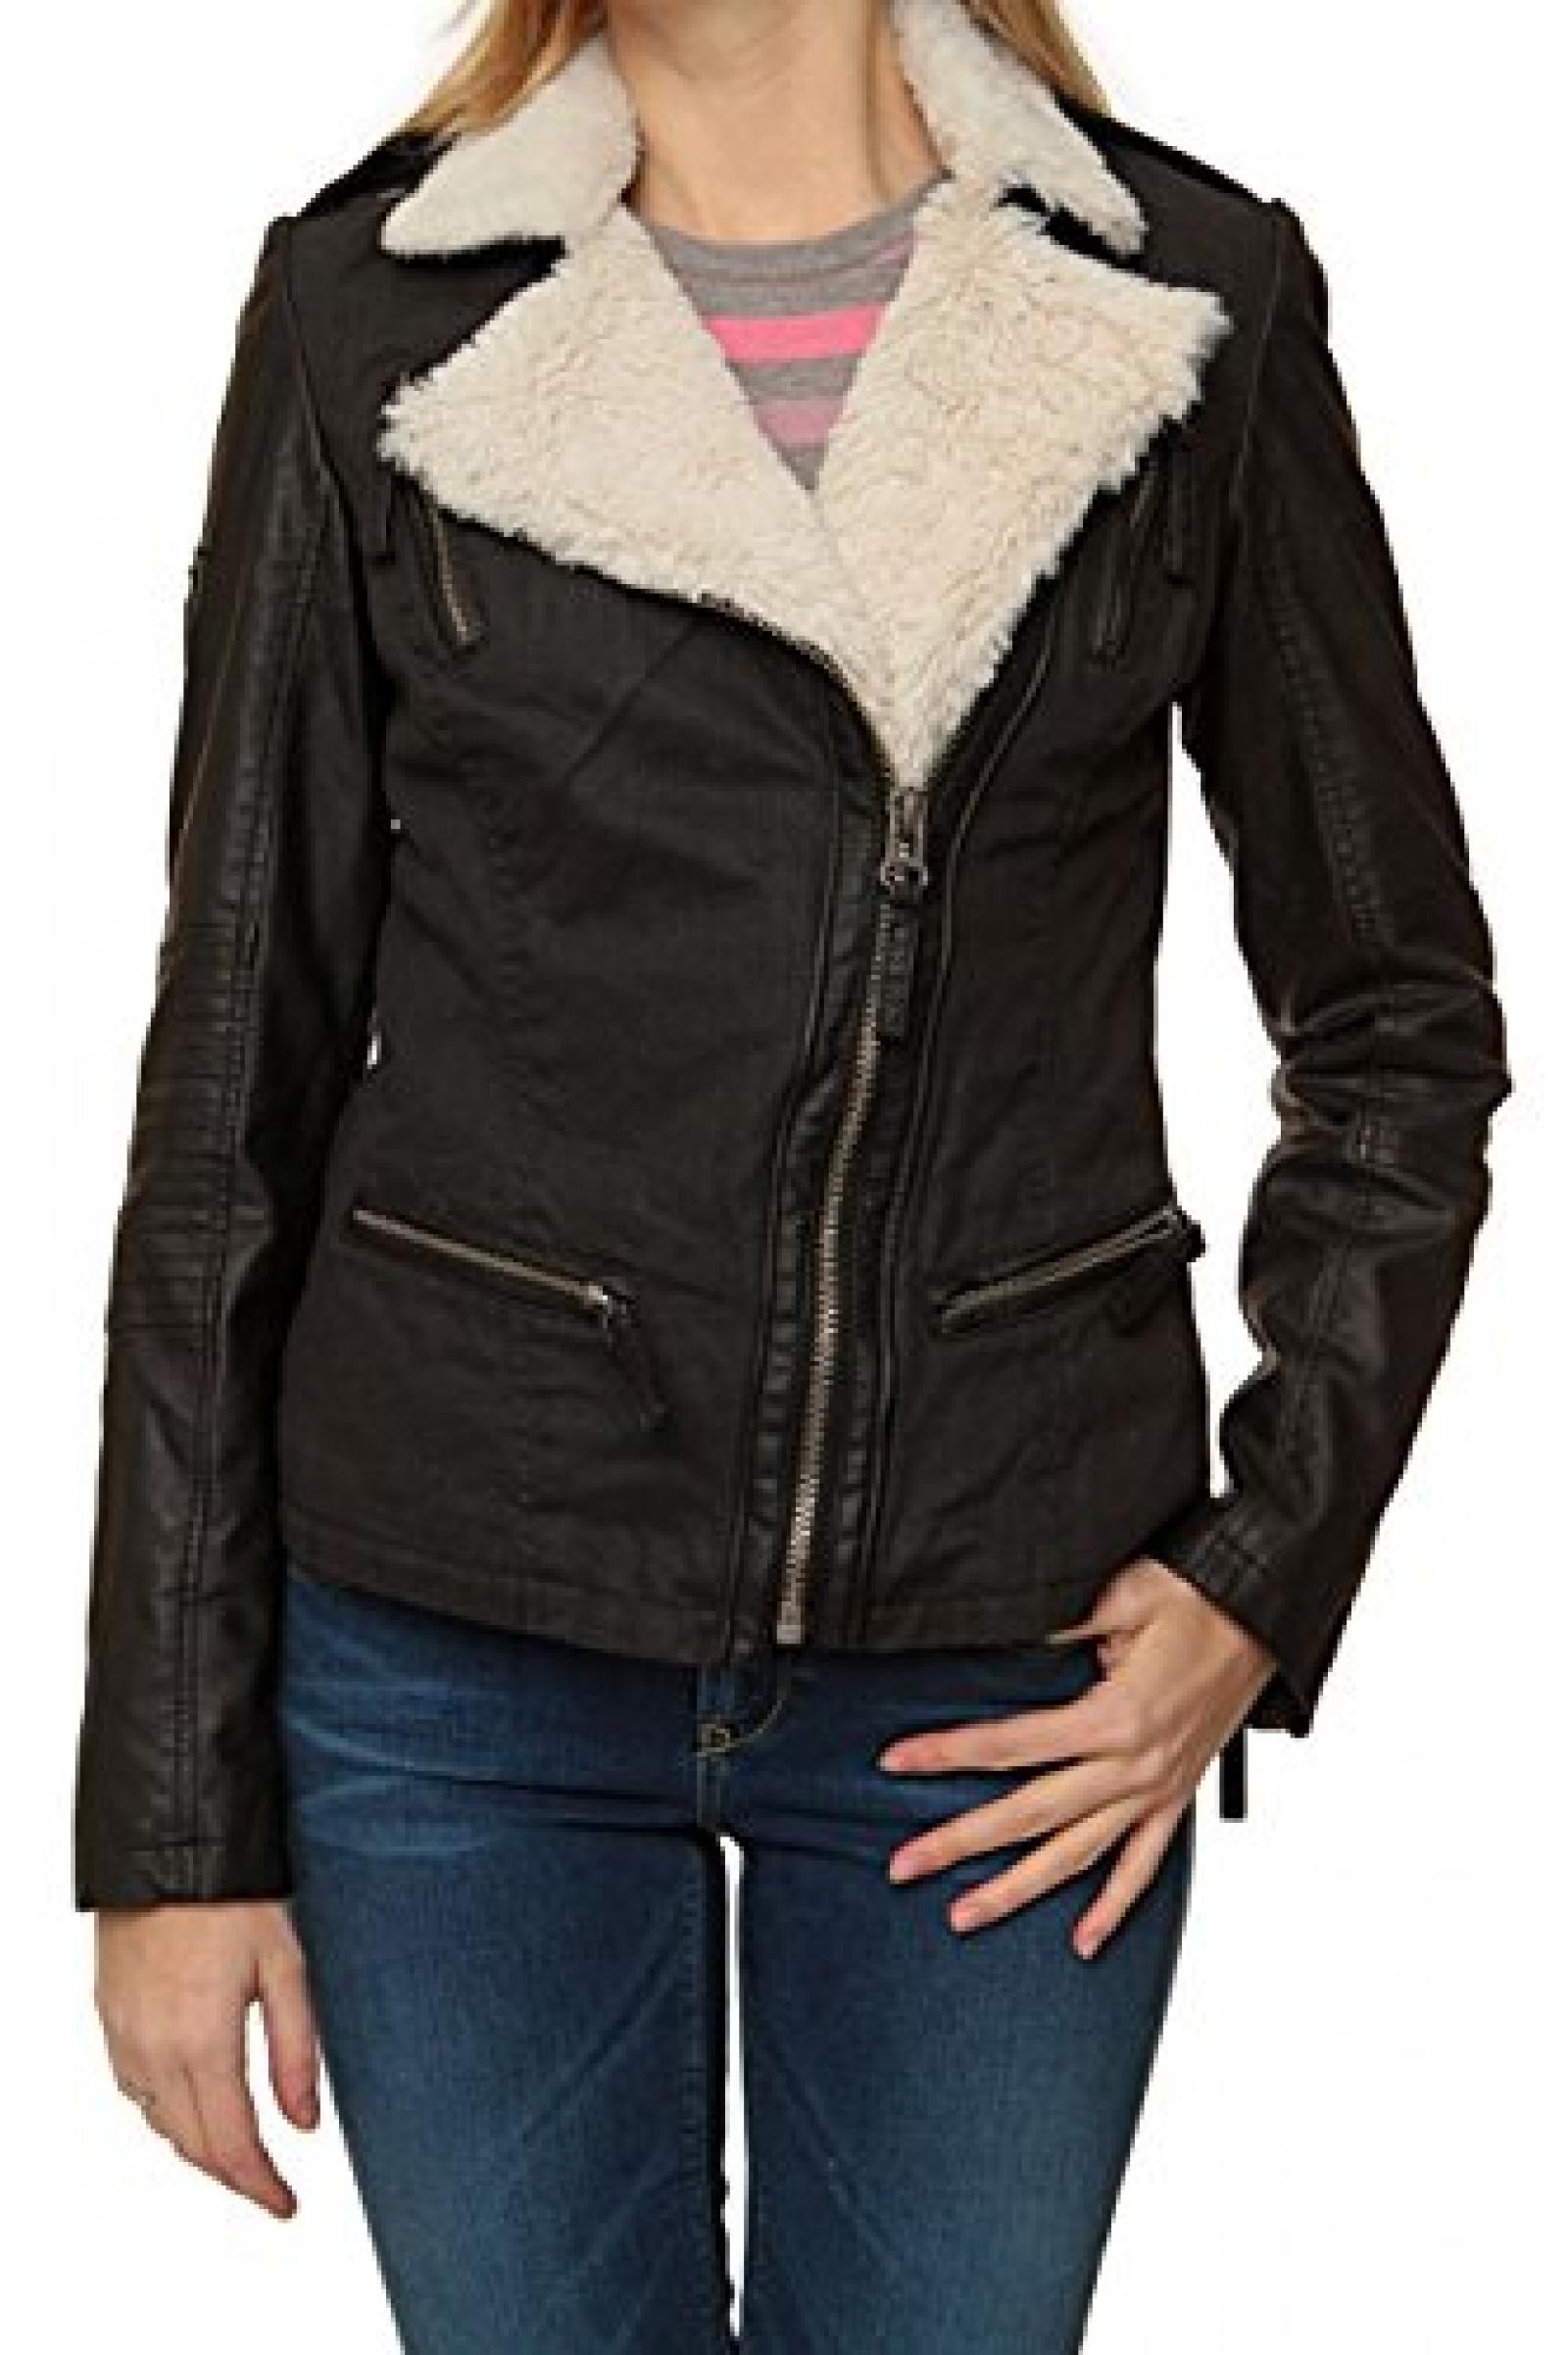 Maze Damen Jacke M-Line Jacke, Farbe: Schwarz